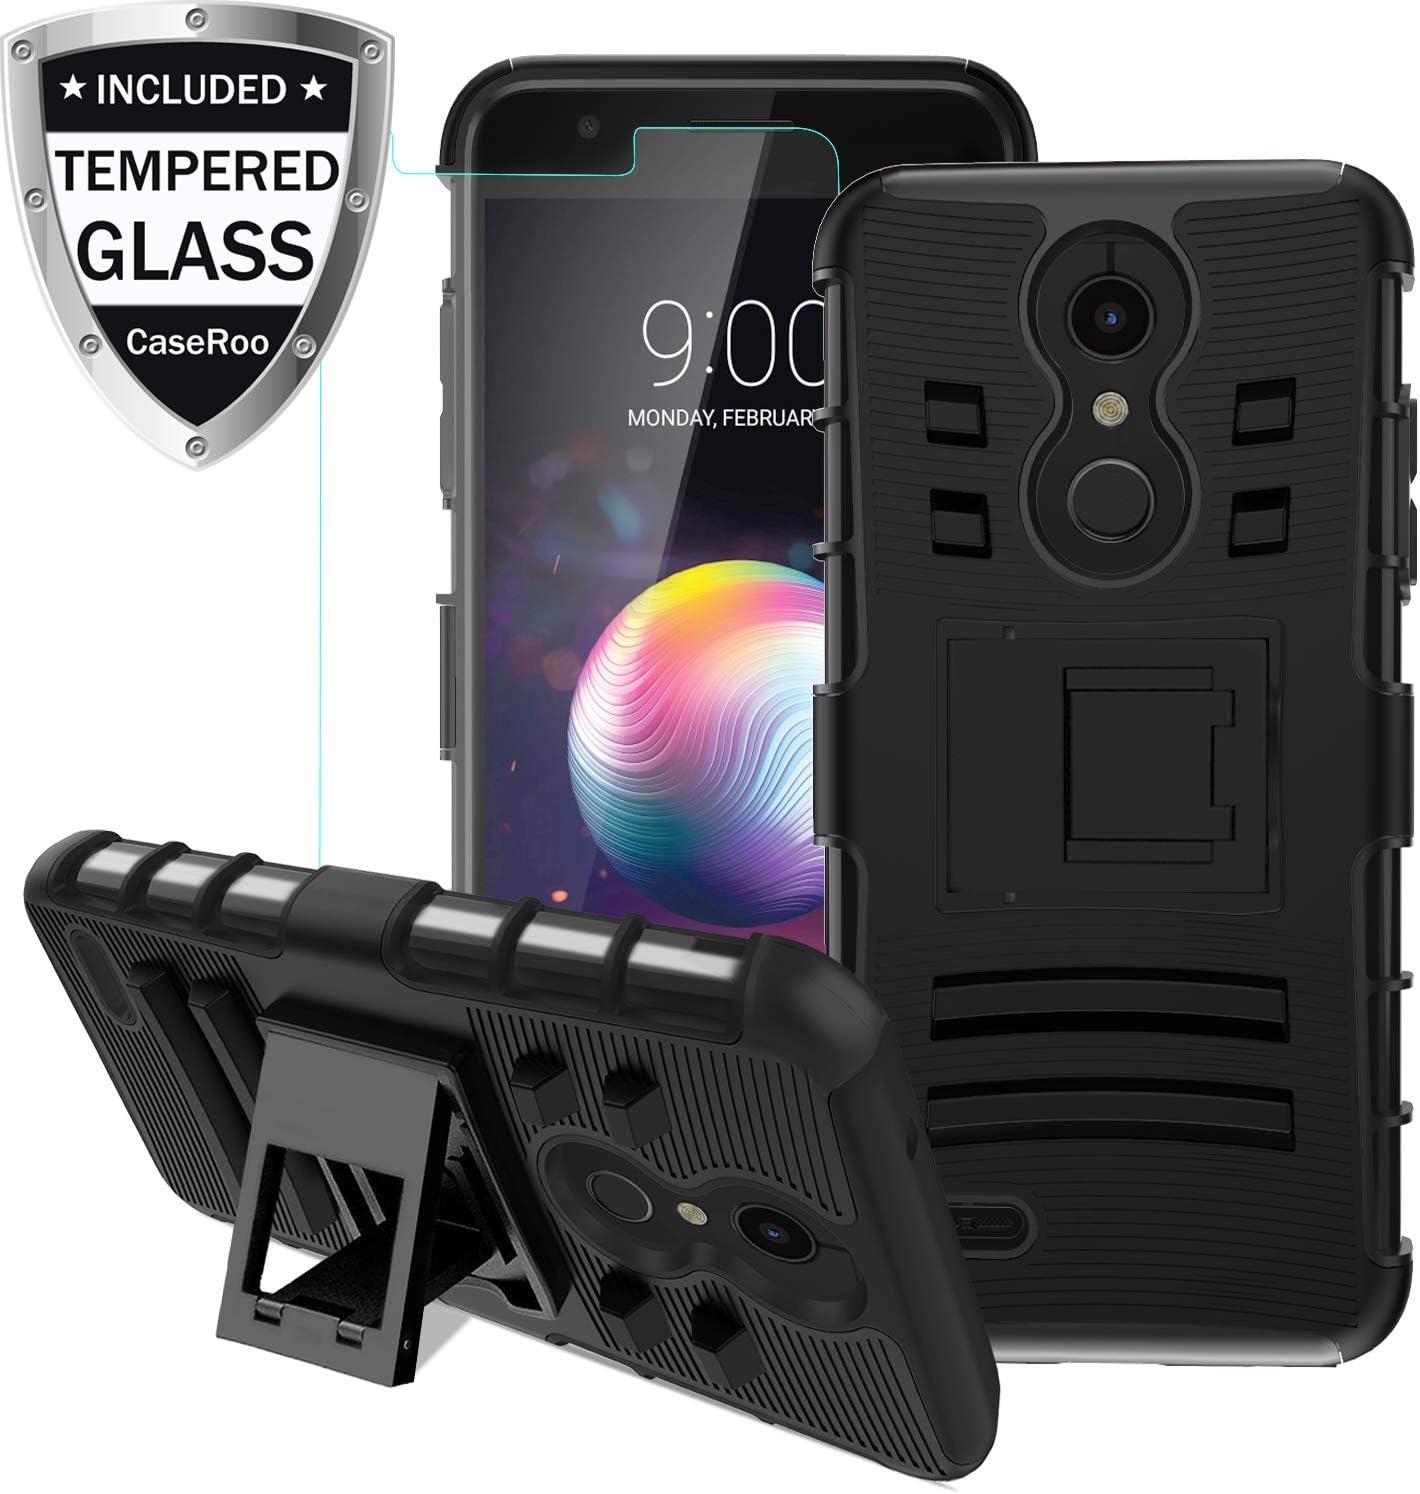 LG K30 Case,LG K10 2018/LG Xpression Plus/LG CV3 Prime/LG Harmony 2/LG Phoenix Plus/Premier Pro LTE Case w/Tempered Glass Screen Protector,Kickstand Heavy Duty Shockproof Protective Phone Cover,Black